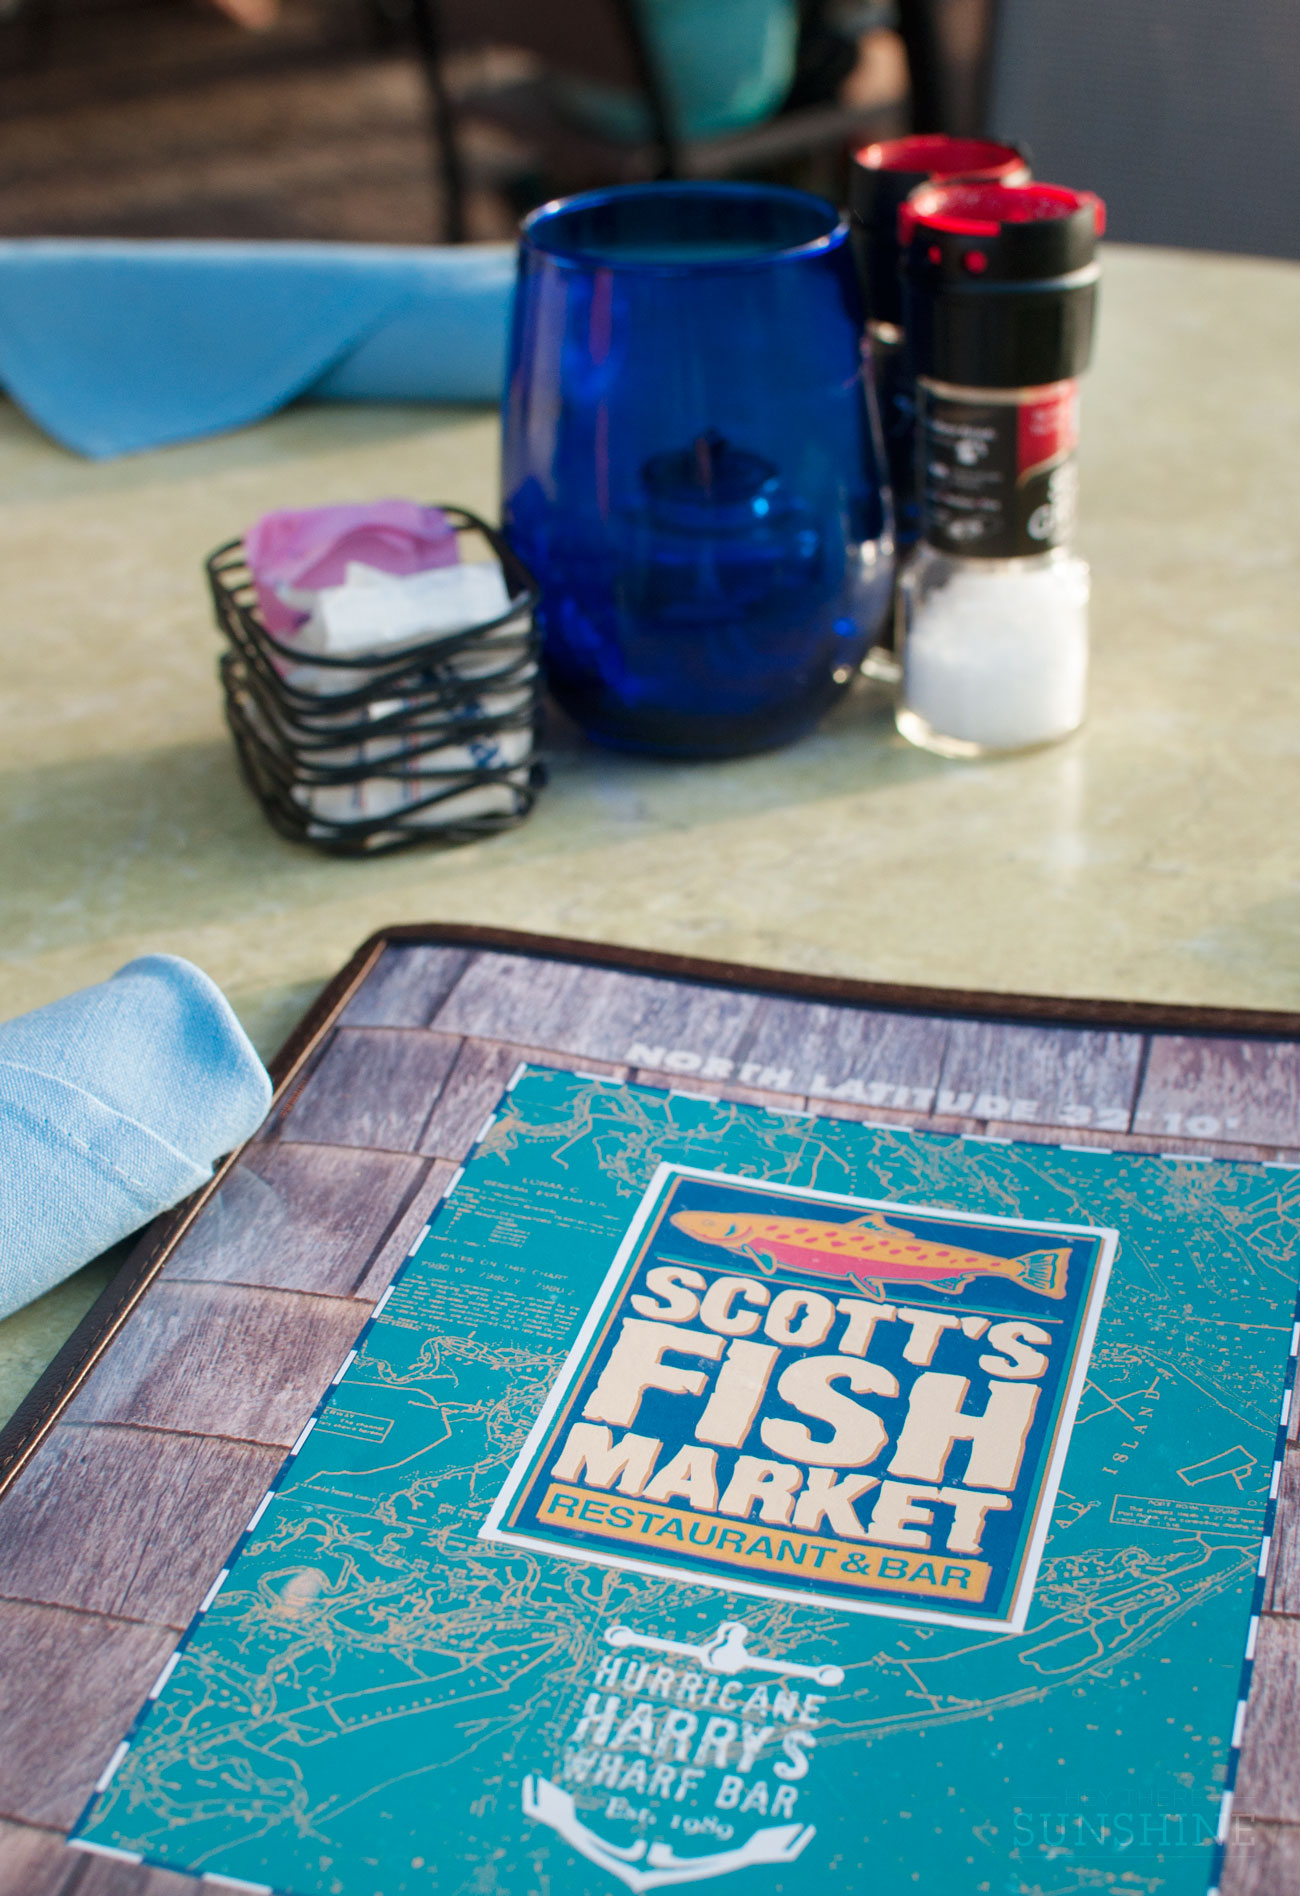 The menu from Scott's Fish Market in Hilton Head, SC.